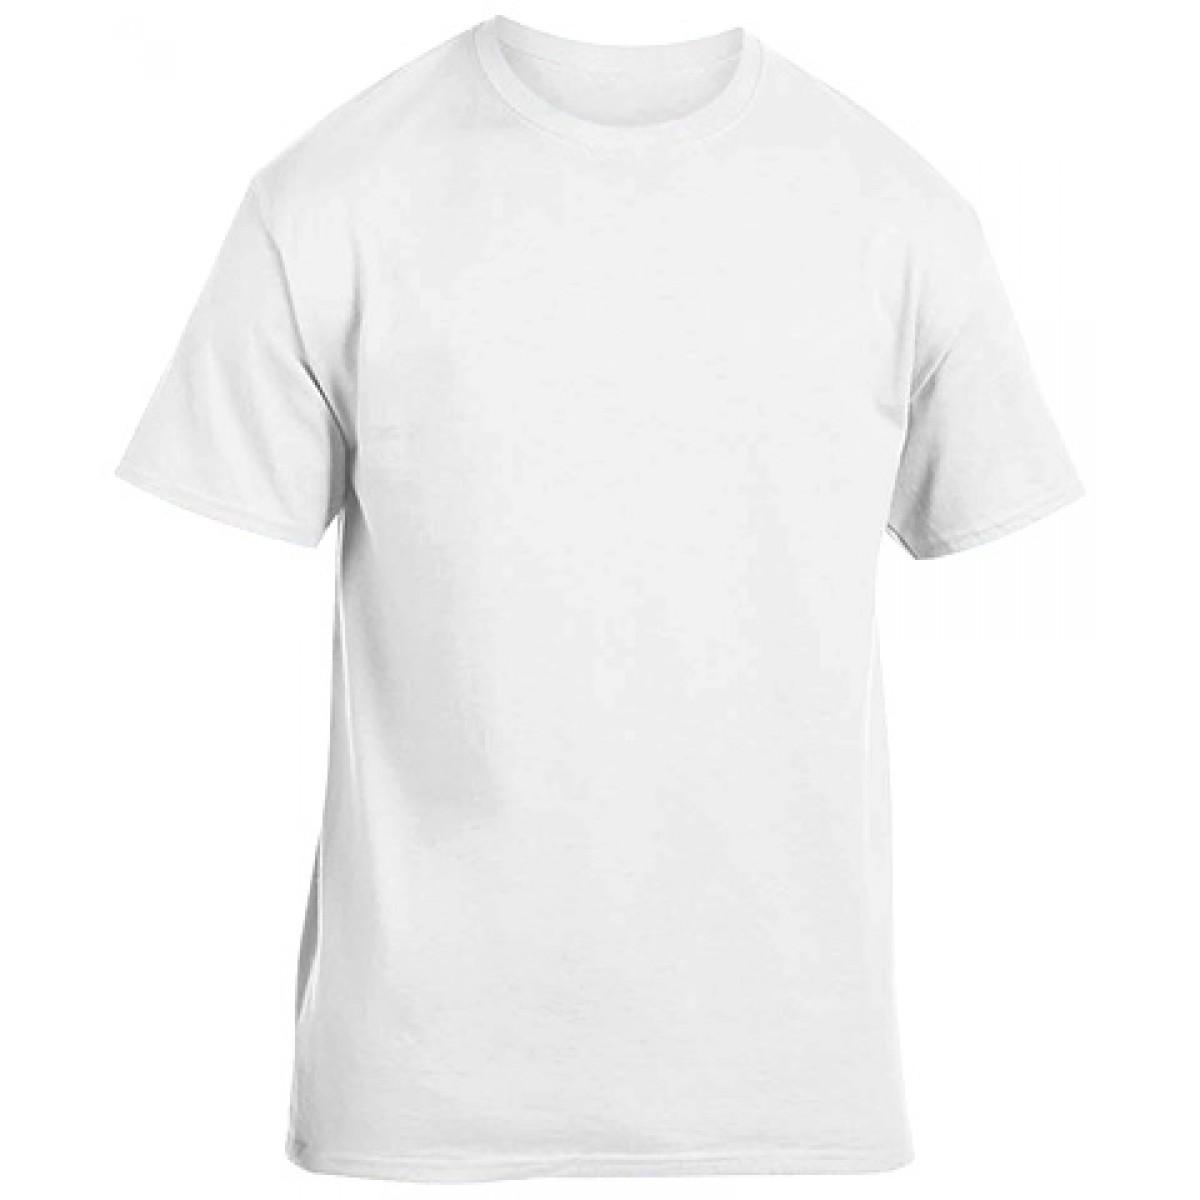 Cotton Short Sleeve T-Shirt Safety Green